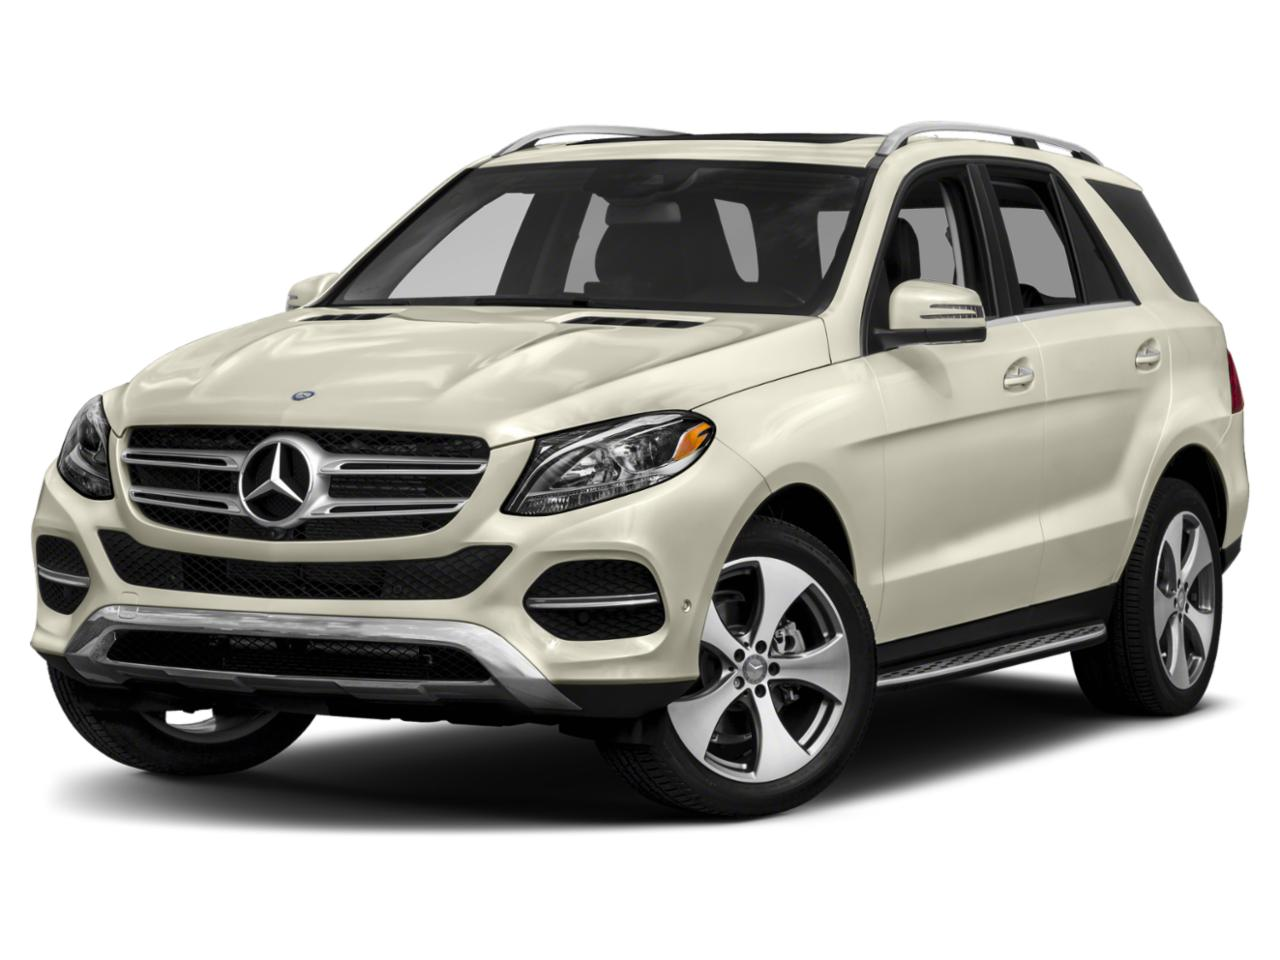 2018 Mercedes-Benz GLE Vehicle Photo in SELMA, TX 78154-1459